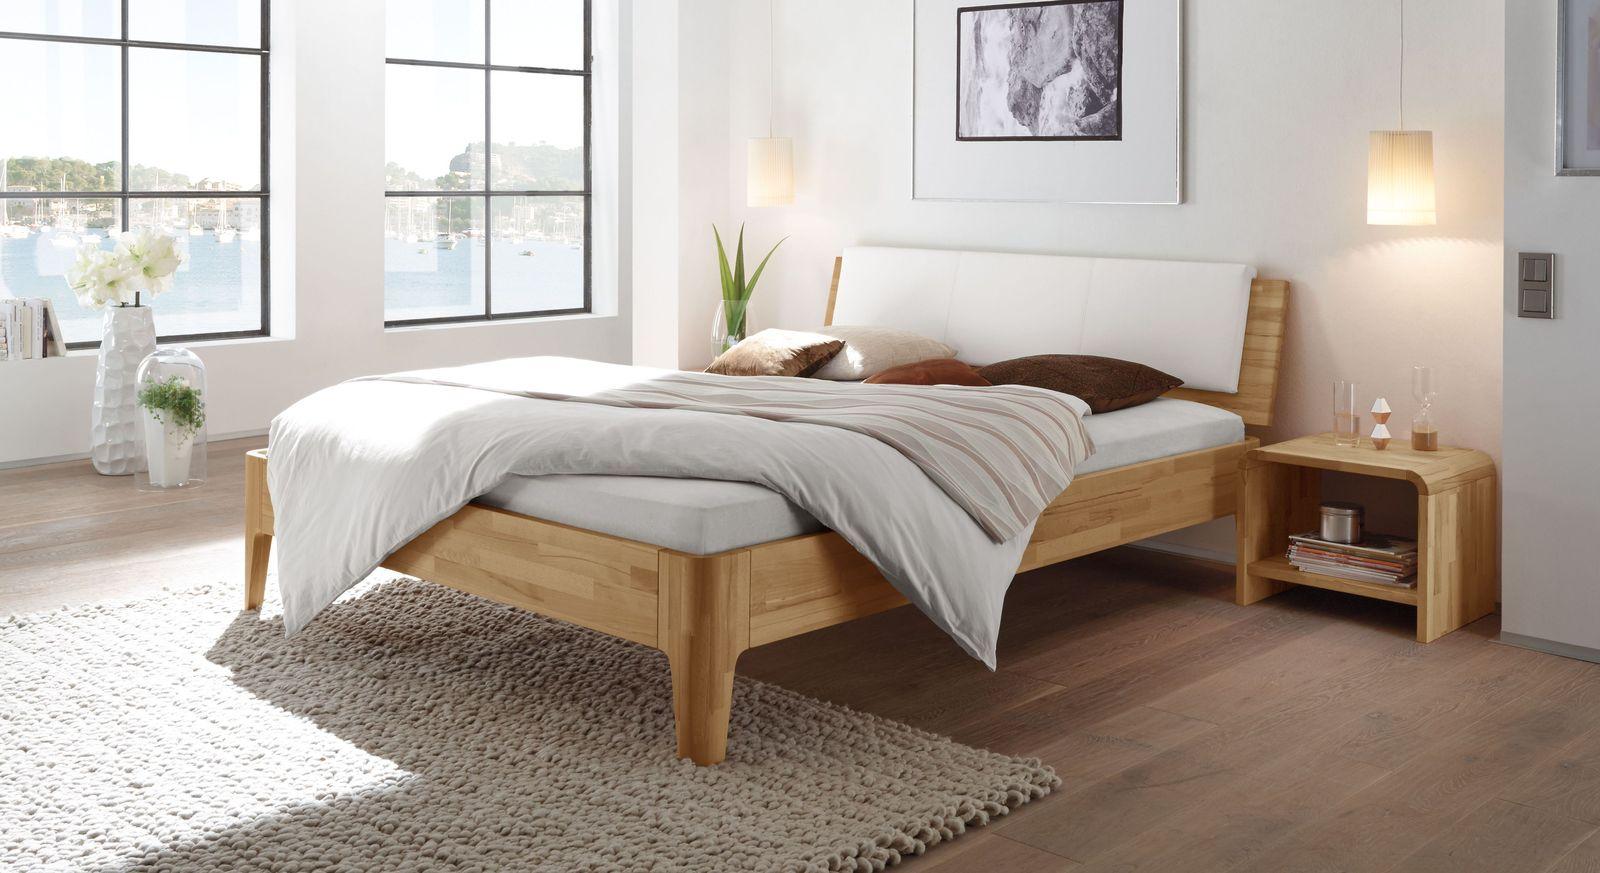 kopfteil bett polster elegant dreieckige kissen kopfteil. Black Bedroom Furniture Sets. Home Design Ideas